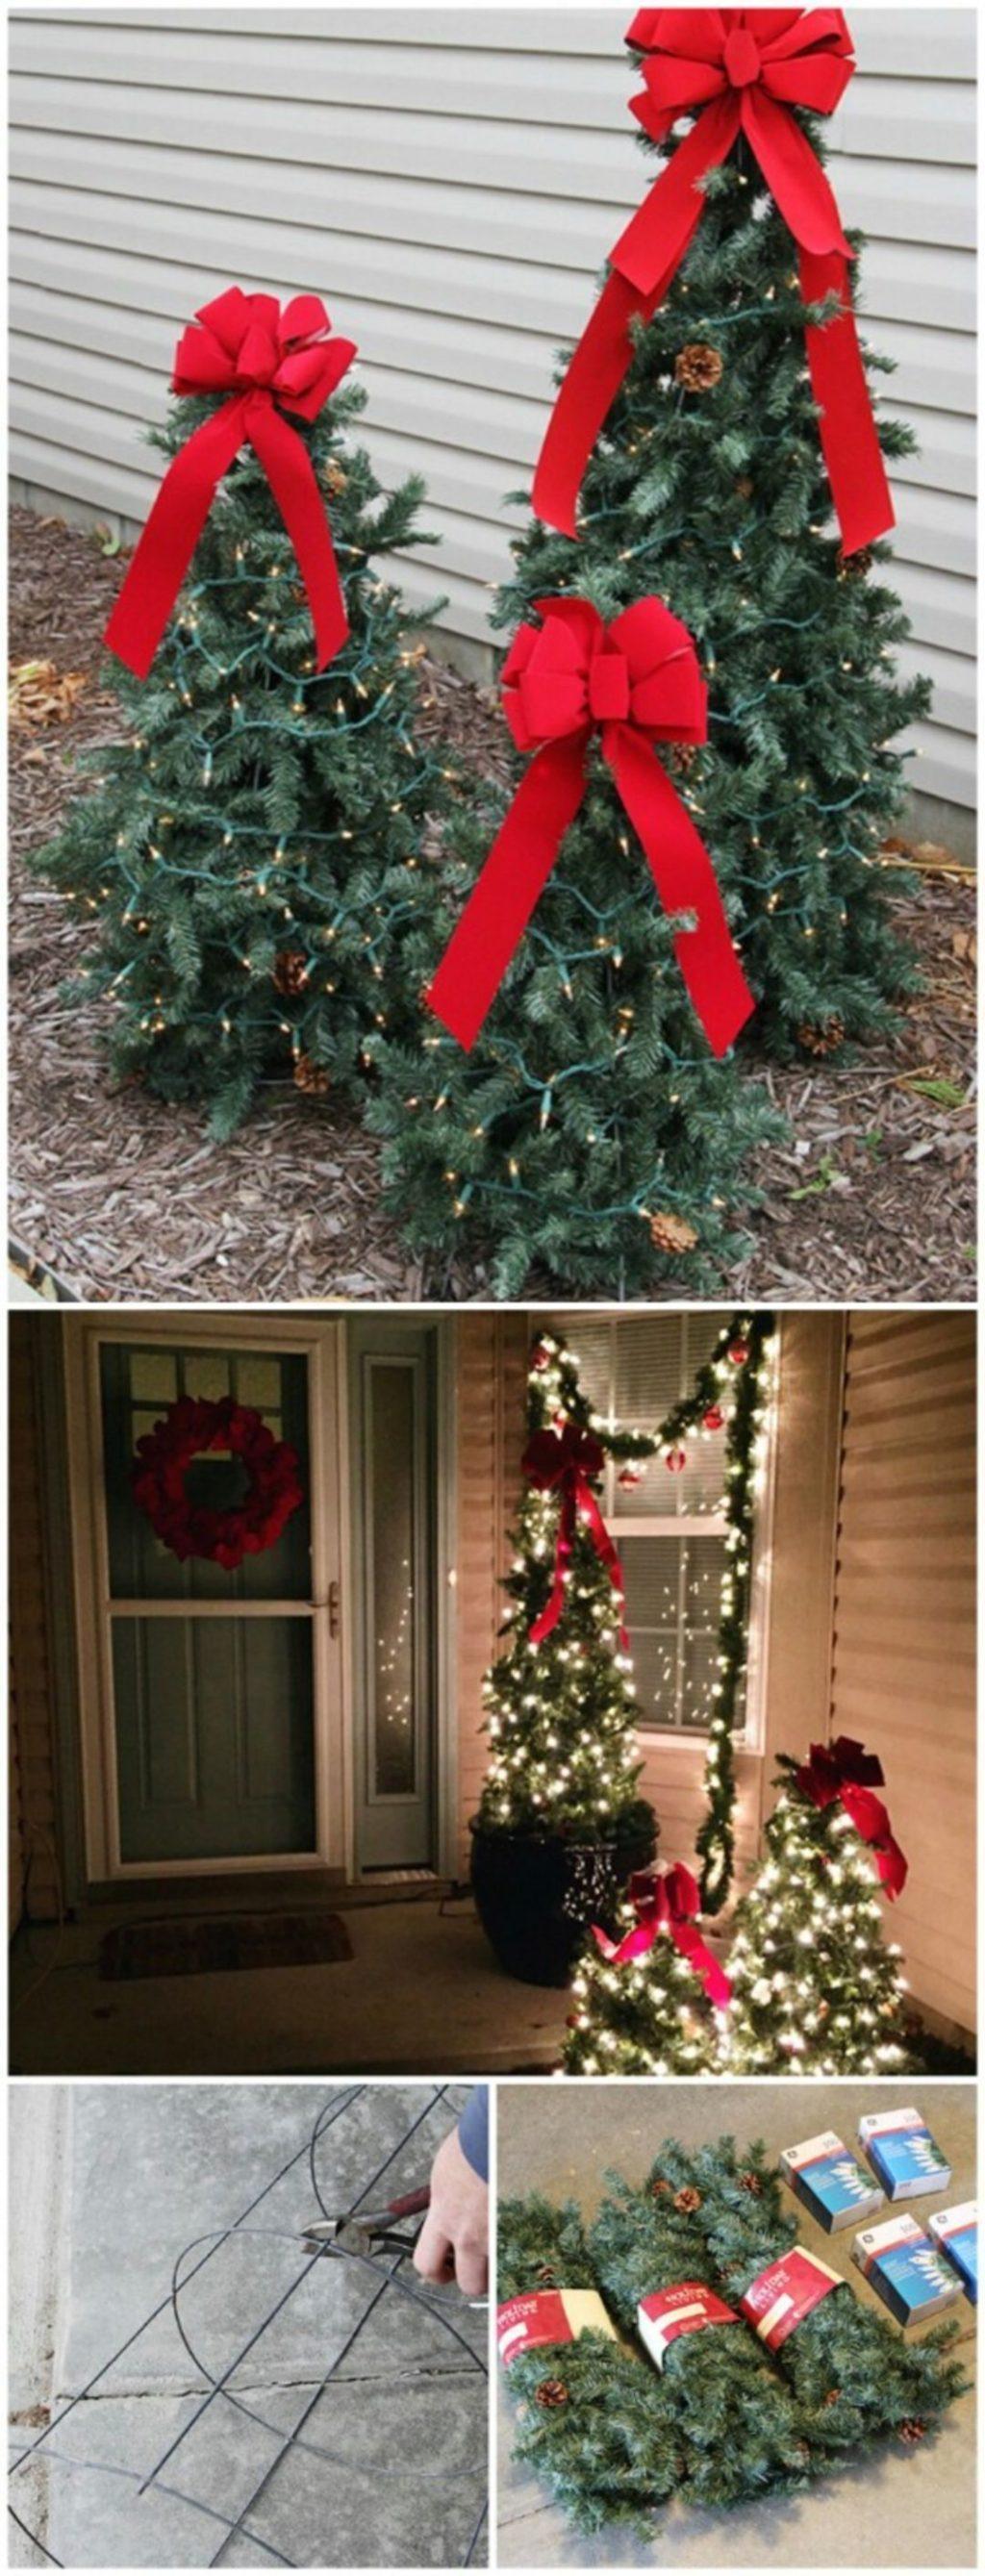 DIY-Christmas-lighting.-2-1024x2678 70+ Impressive Christmas Decorations to Do Yourself in 2021